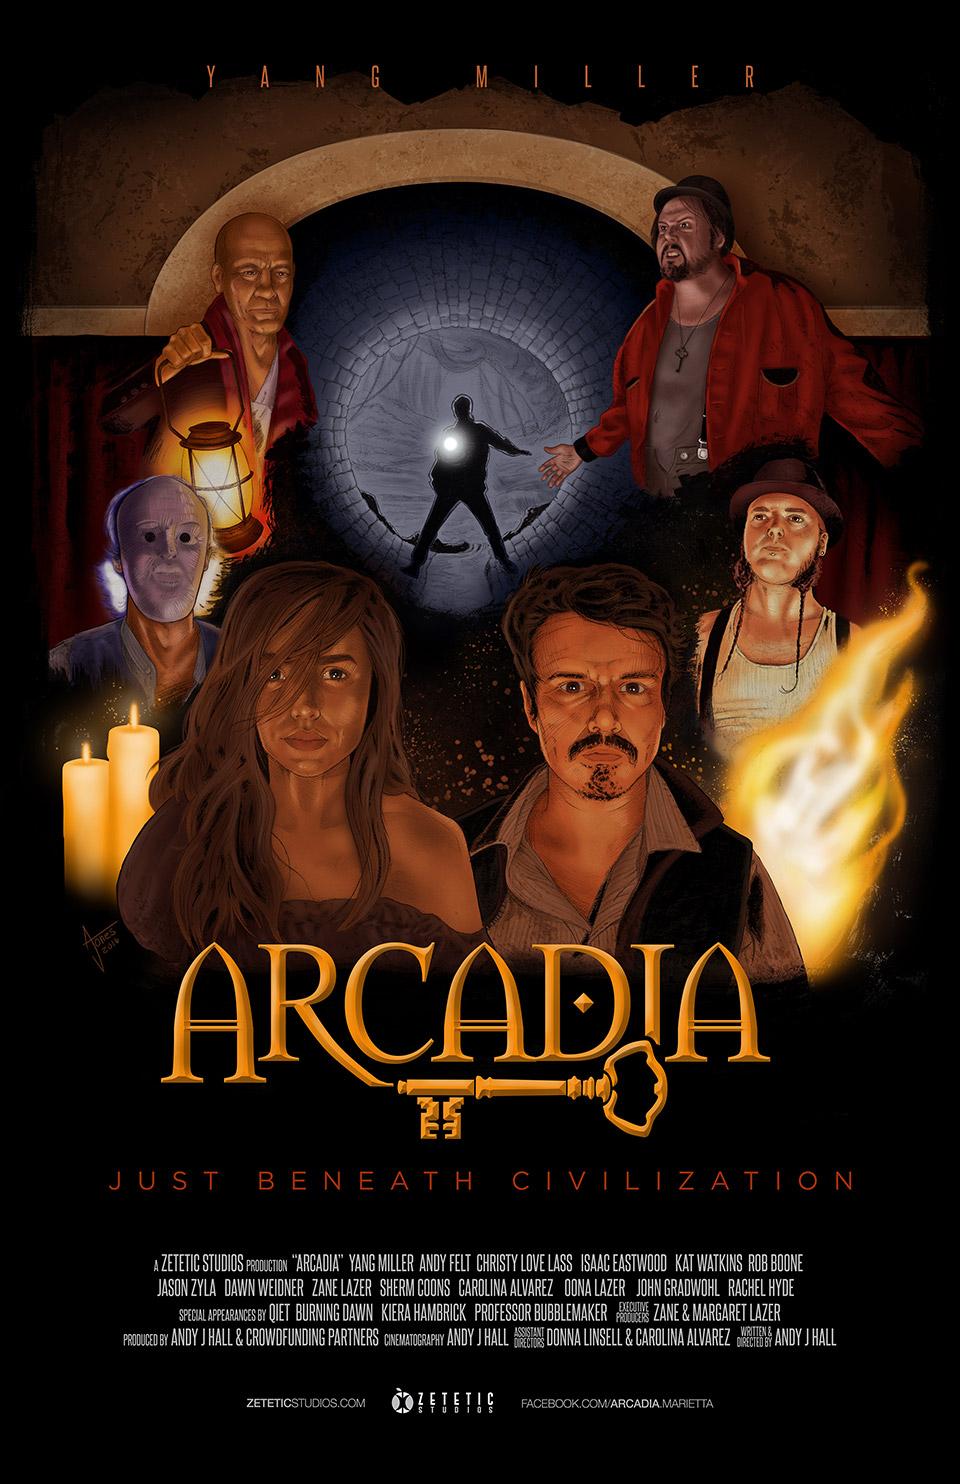 Arcadia Movie Poster by AtlantaJones